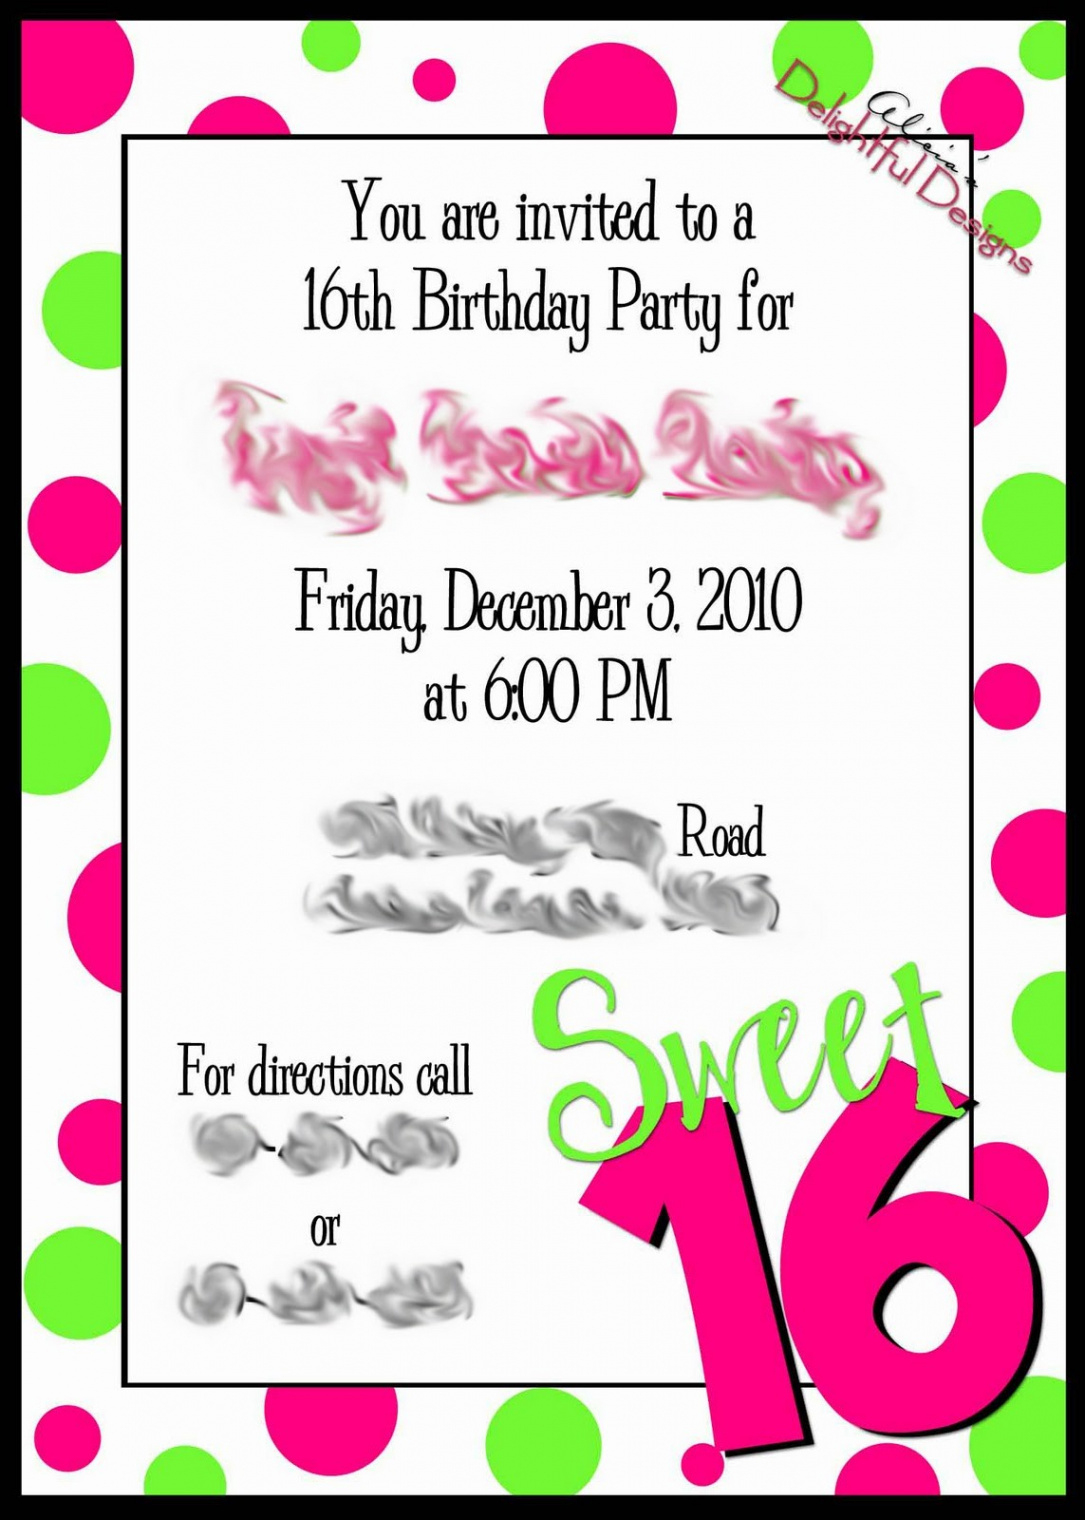 Free Printable 16Th Birthday Party Invitation Templates Luxury - Free Printable 16Th Birthday Party Invitation Templates